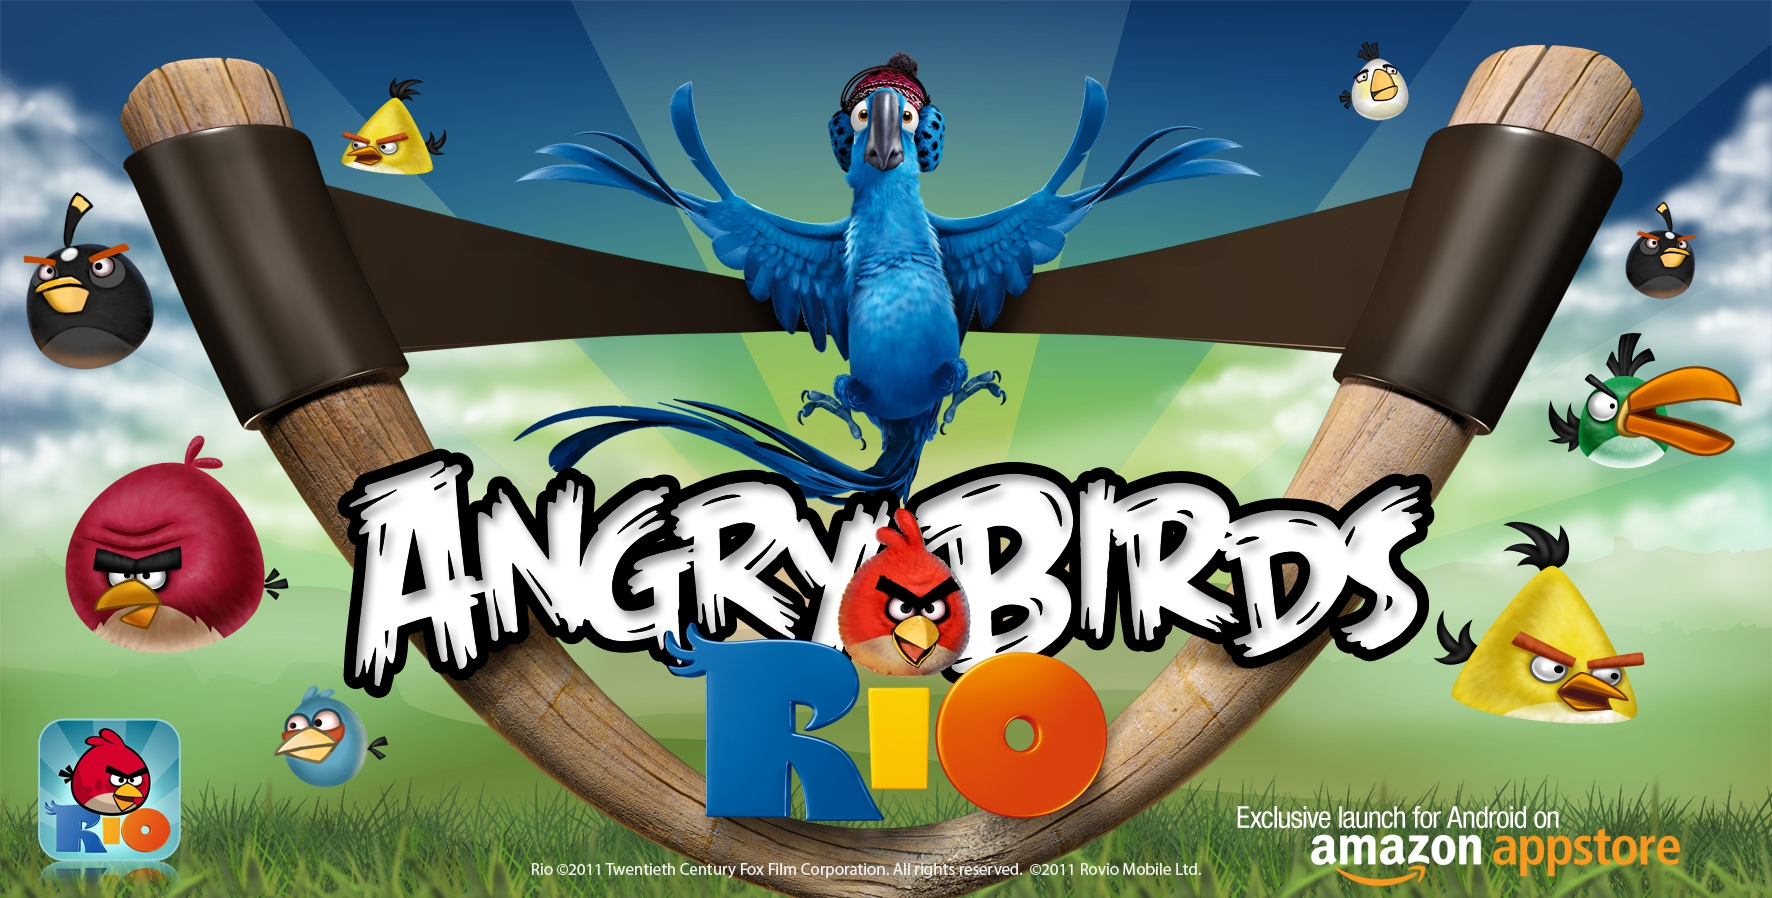 mi subida angry birds angry birds rio pc full engli. Black Bedroom Furniture Sets. Home Design Ideas